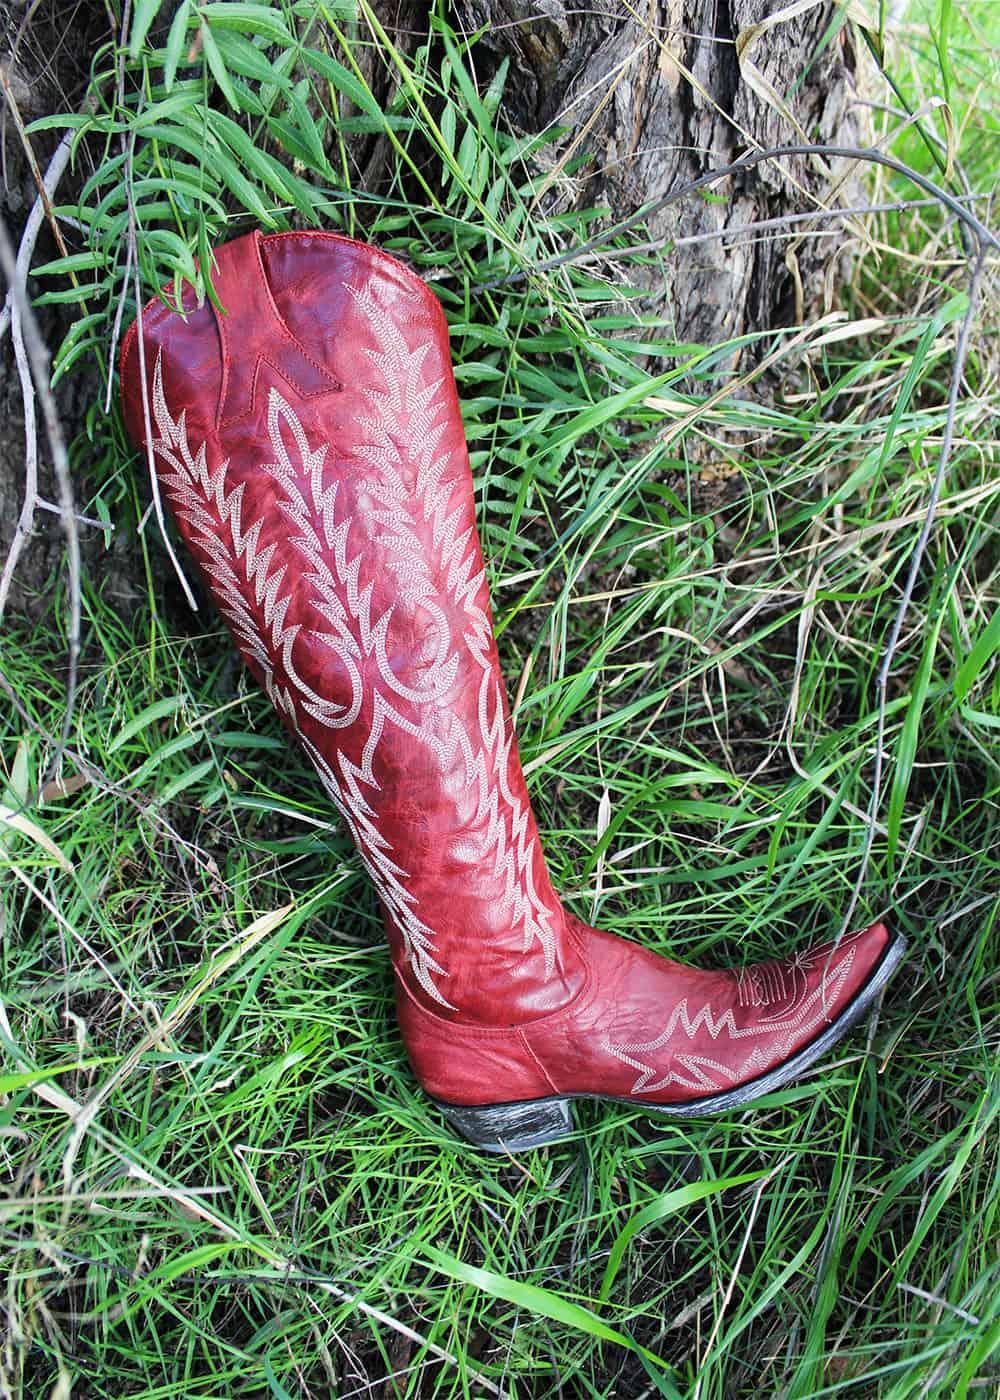 mayra old gringo cowgirl magazine